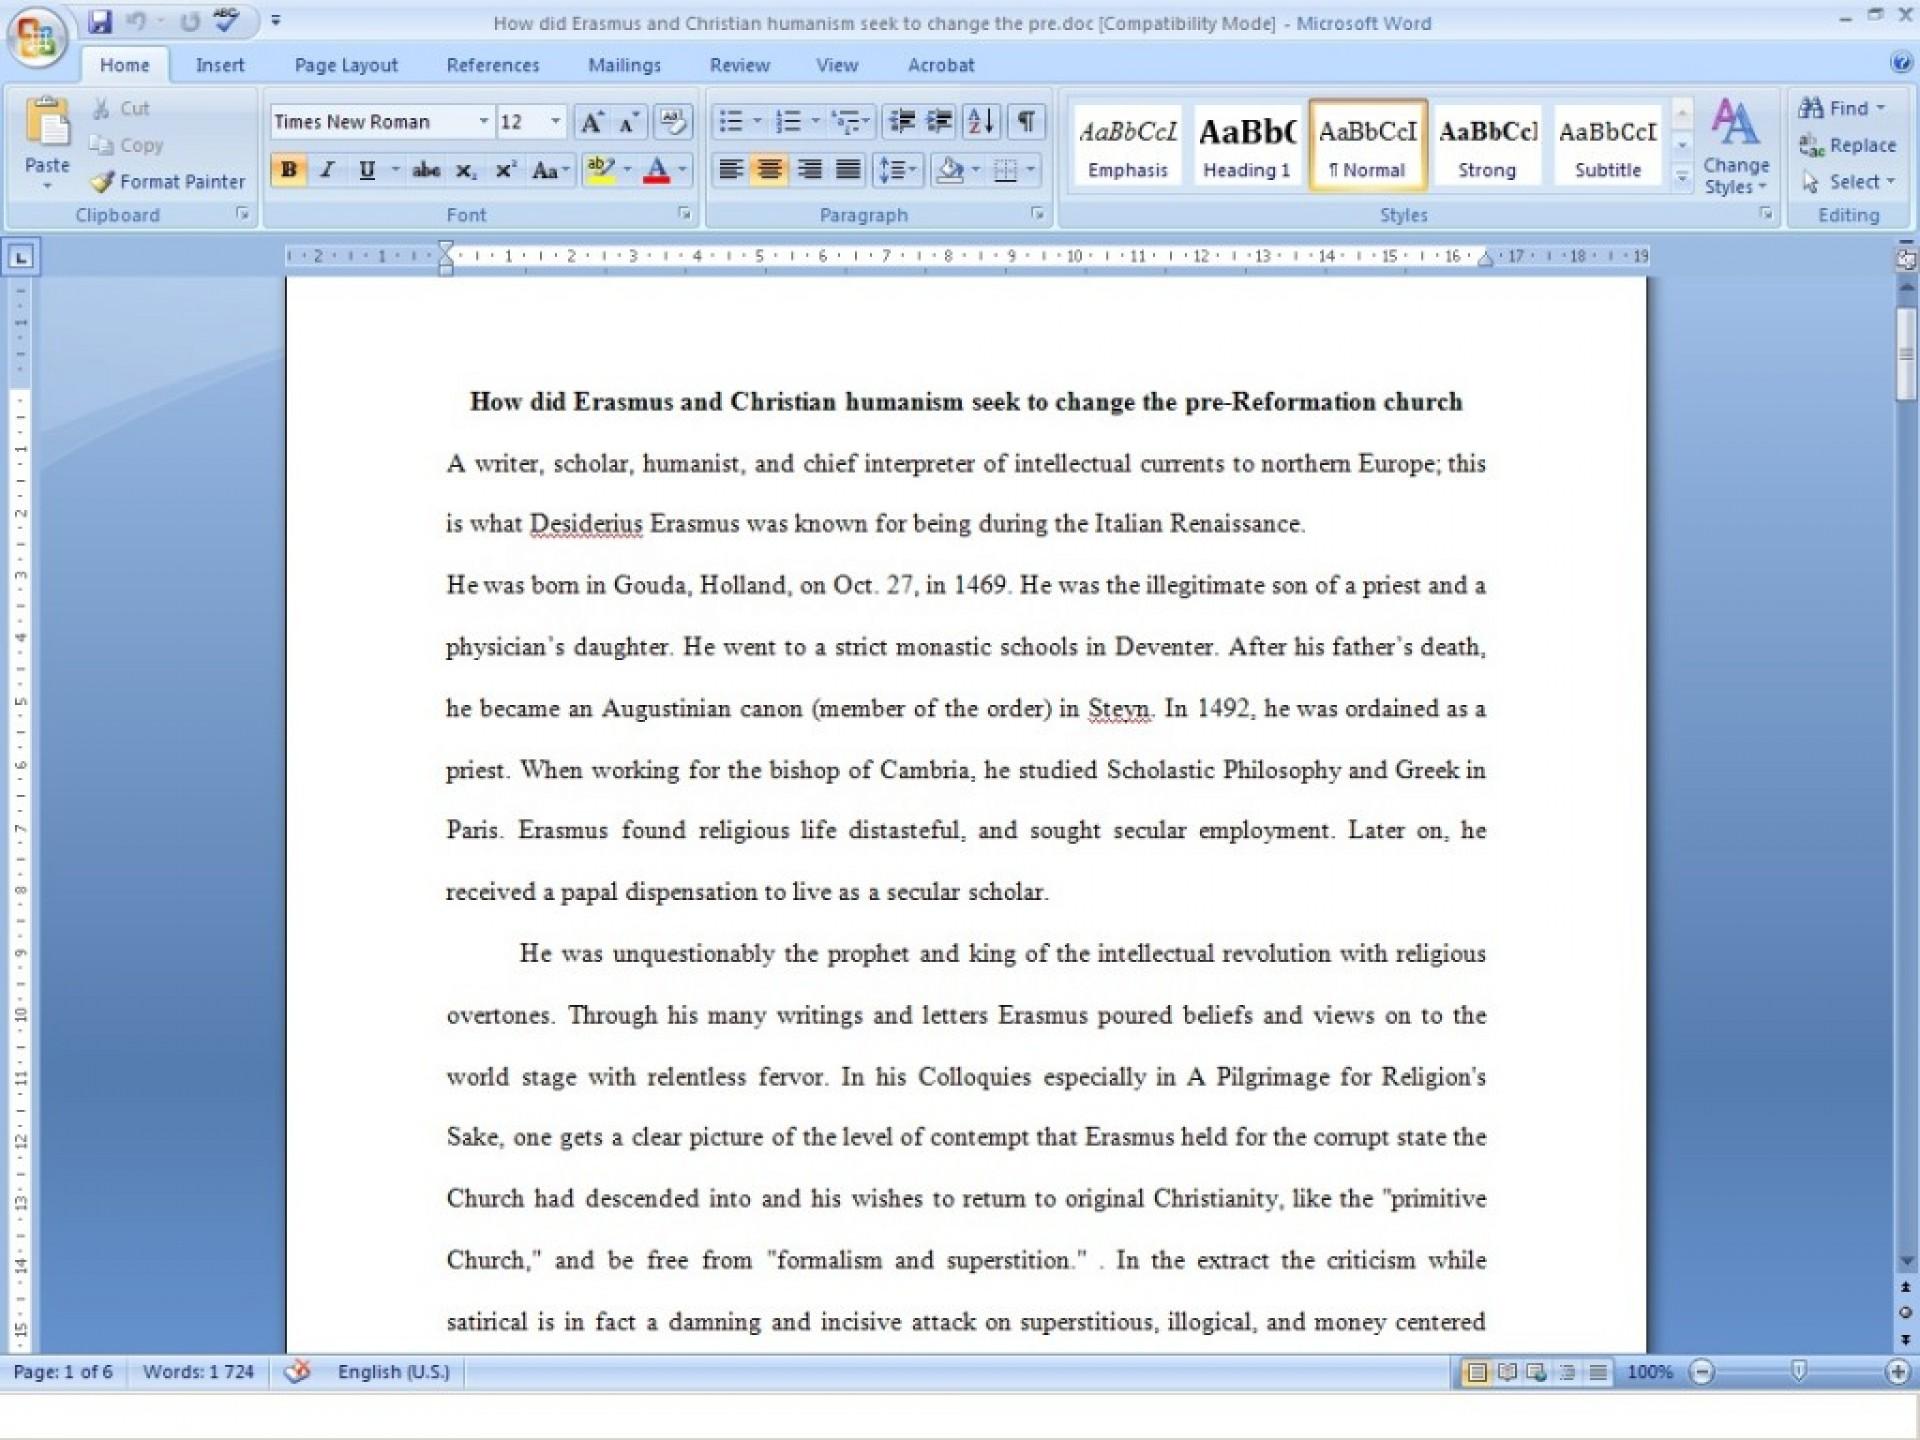 002 Essay Example Custom Online 1024x768 Amazing Essays For Sale Proofreading Free Sell Uk 1920